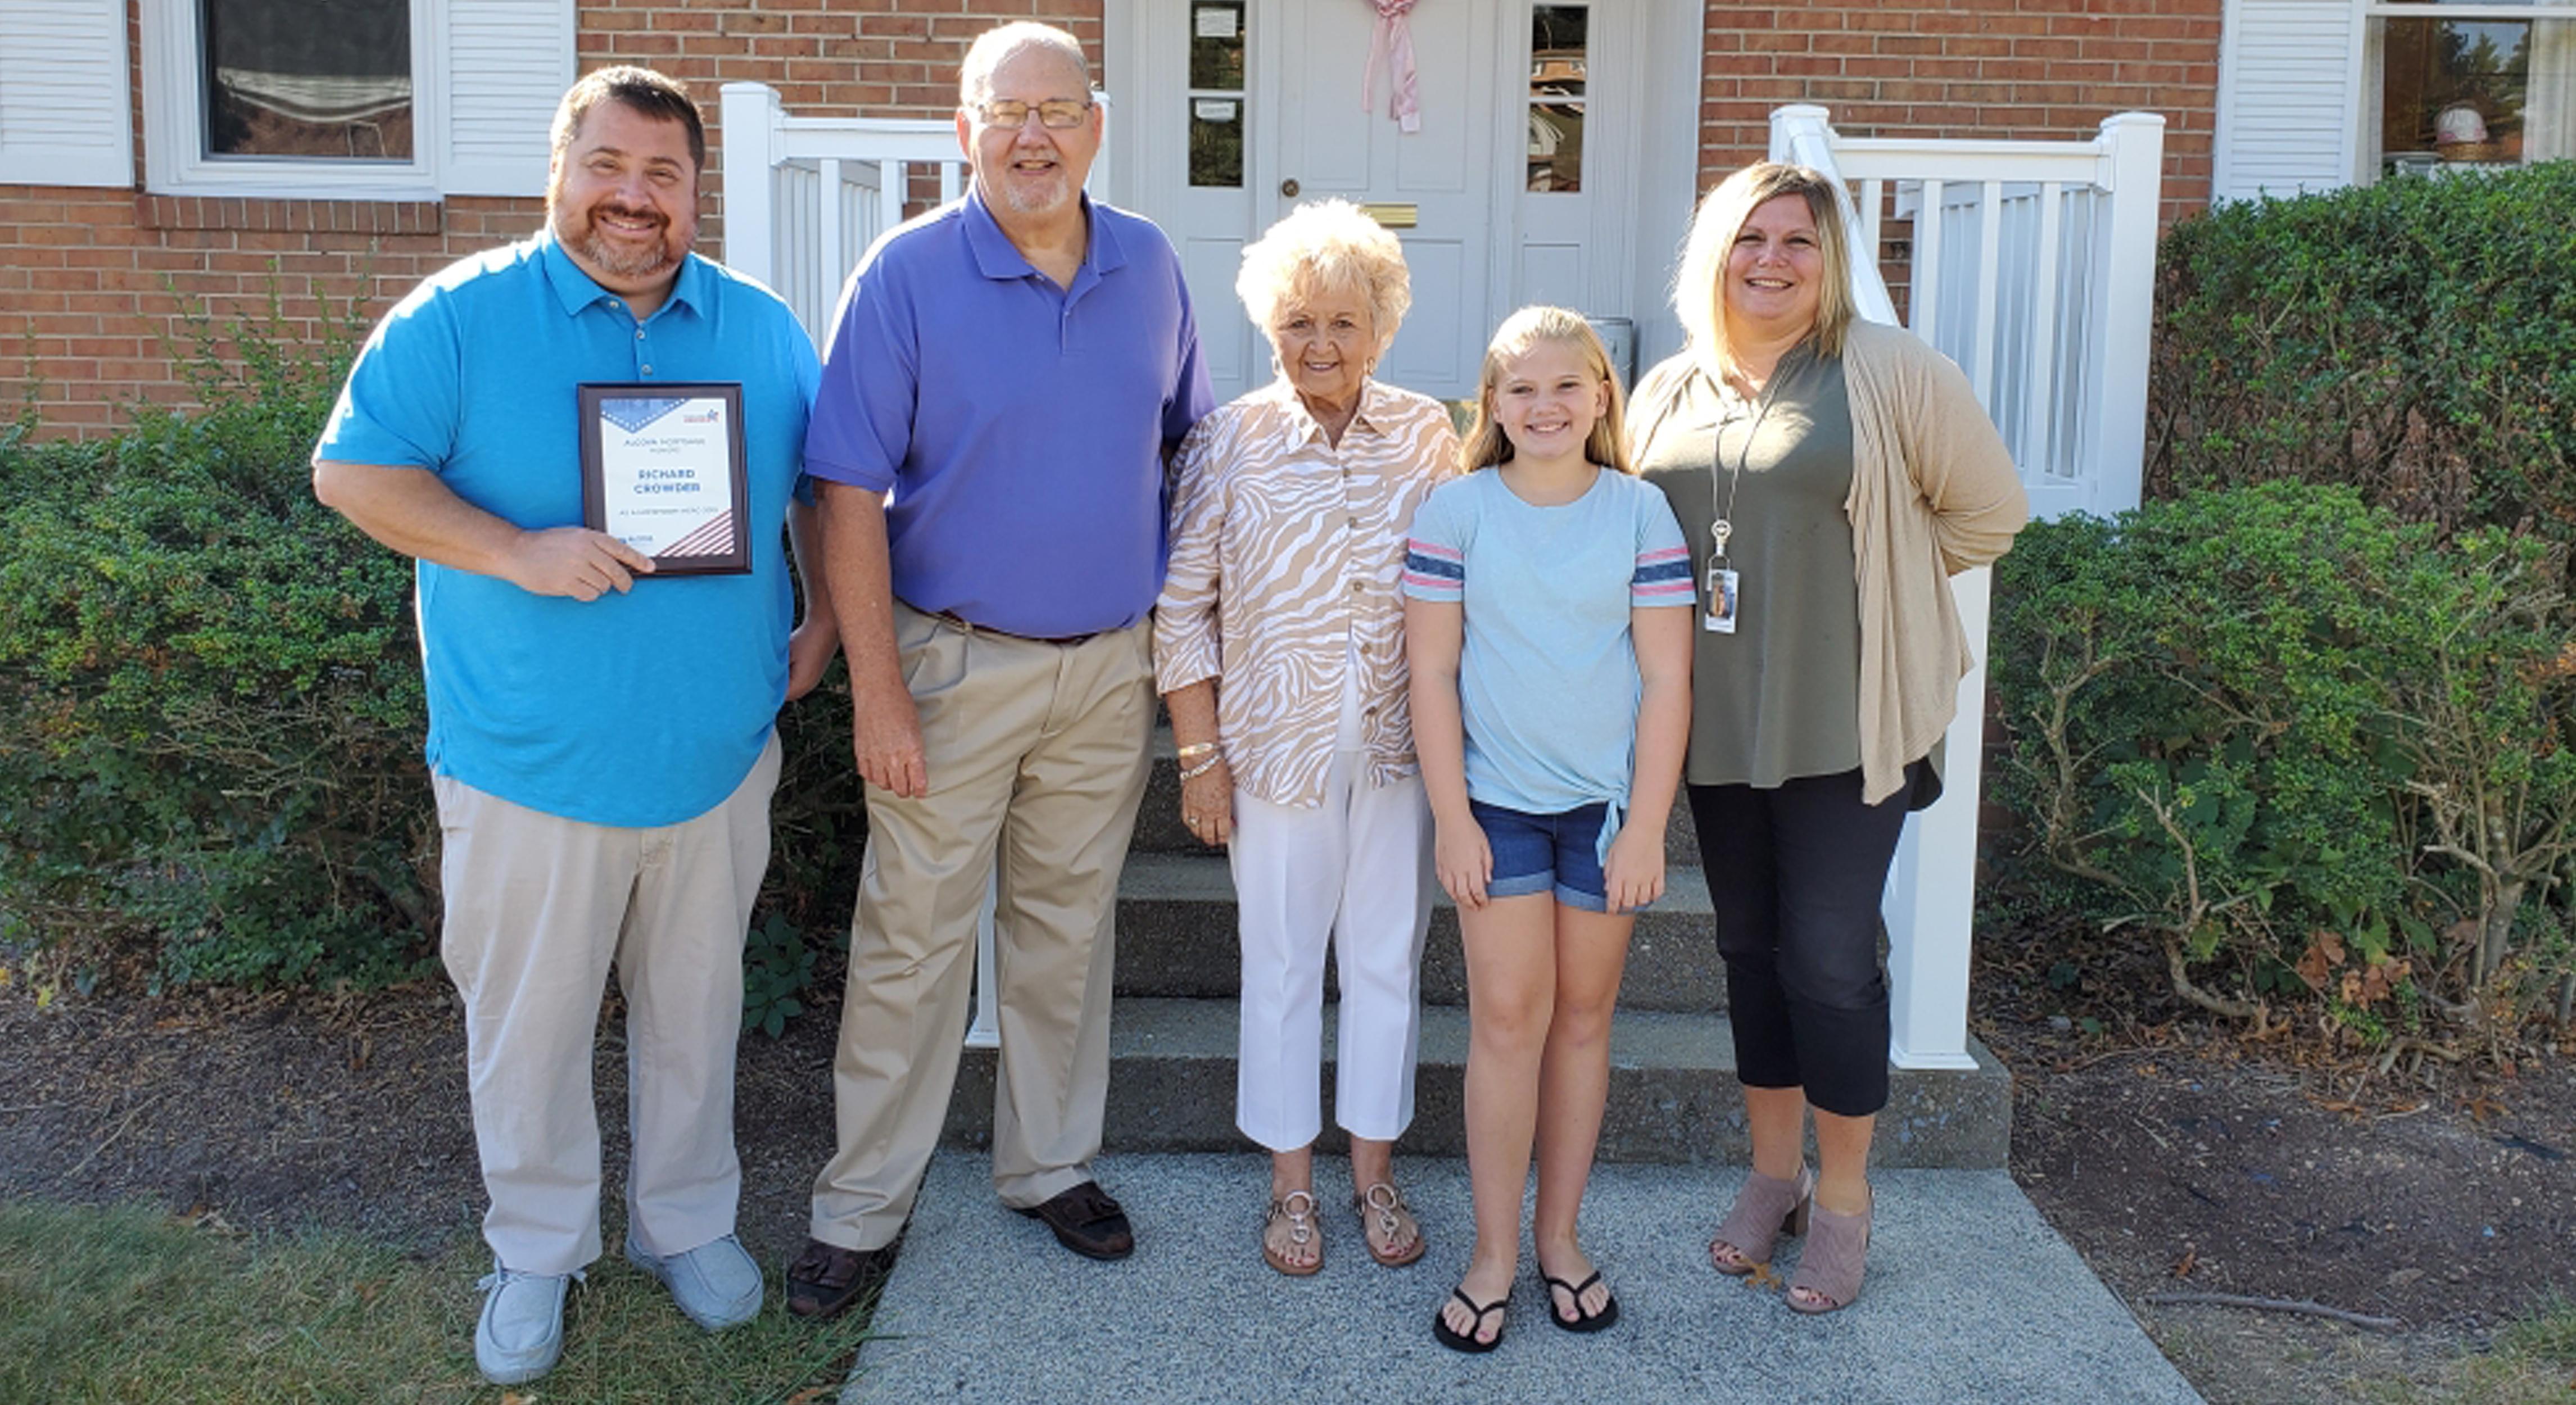 hometown hero richard crowder accepting award